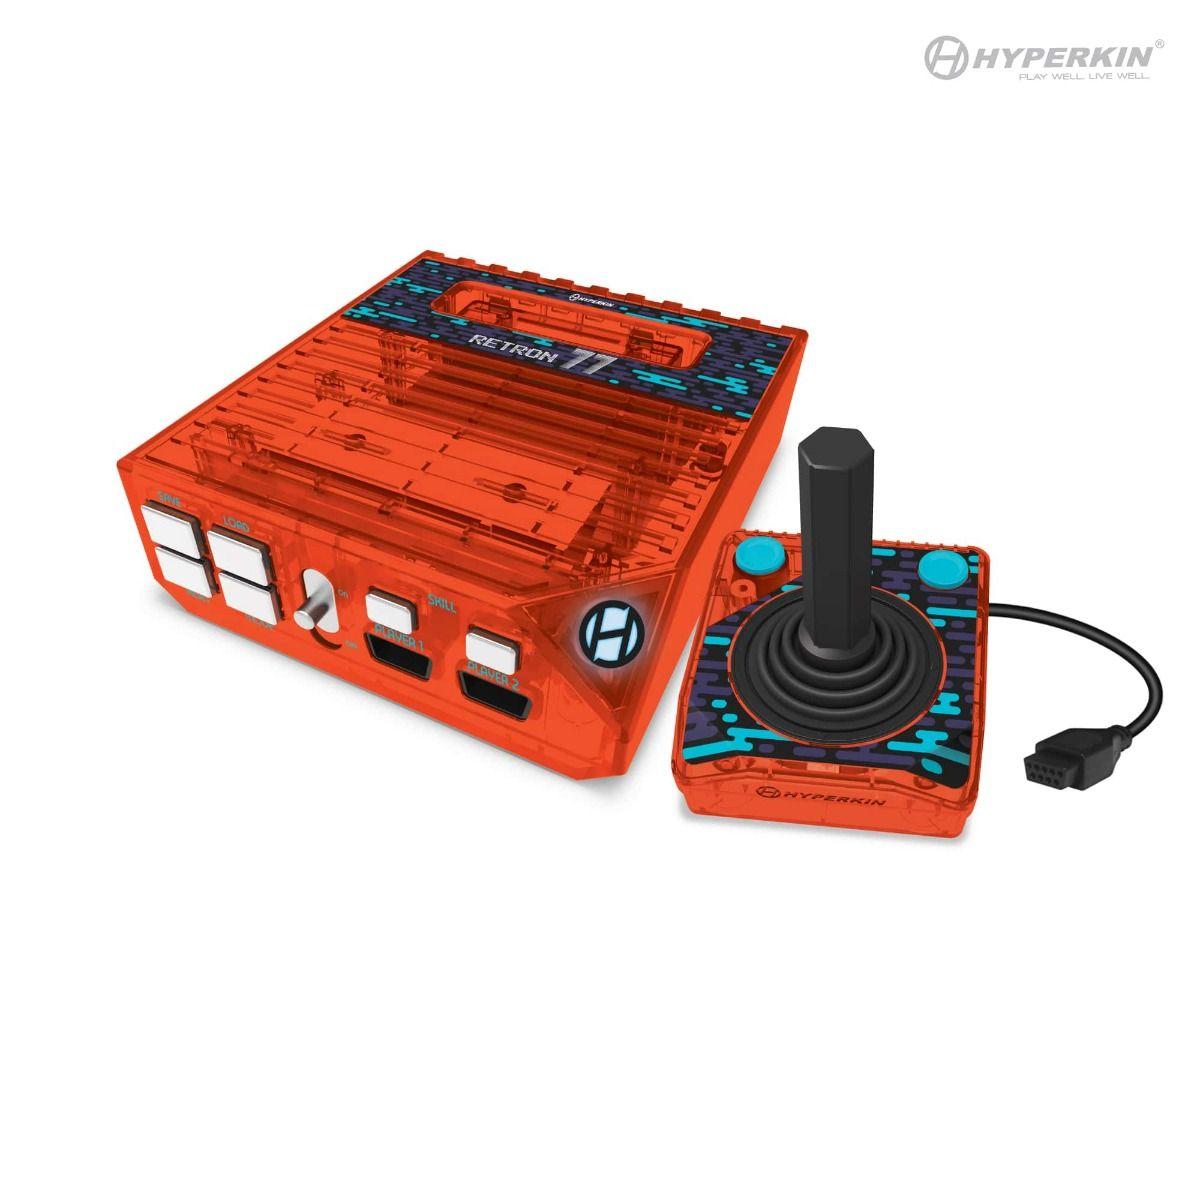 Hyperkin RetroN 77: HD Gaming Console for 2600 - Retro Amber